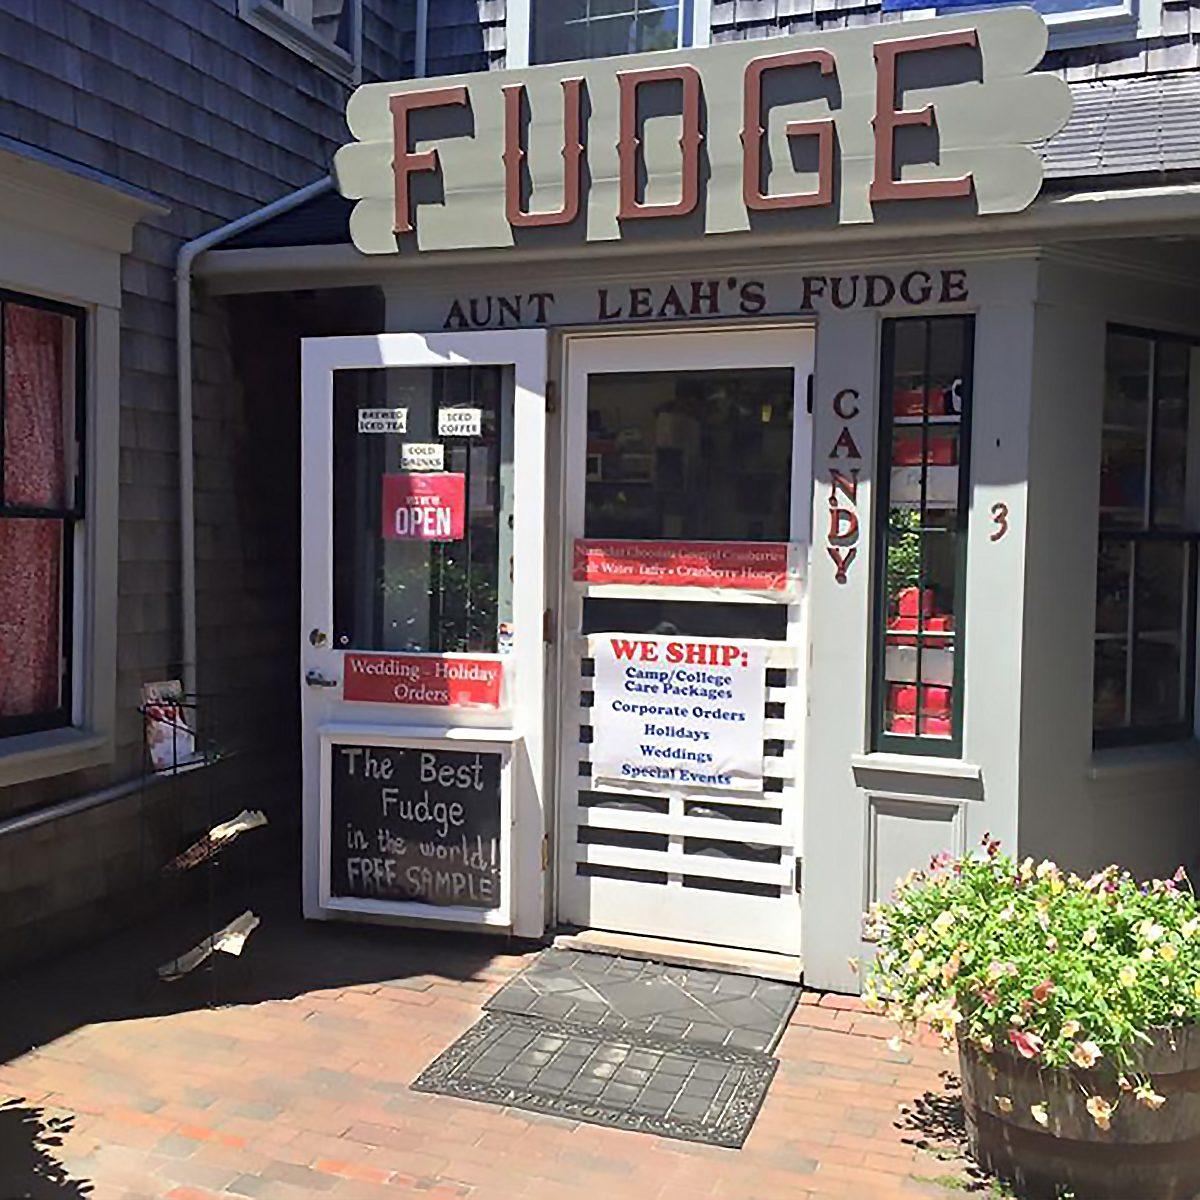 The Best Fudge Shop in Rhode Island - Aunt Leah's Fudge